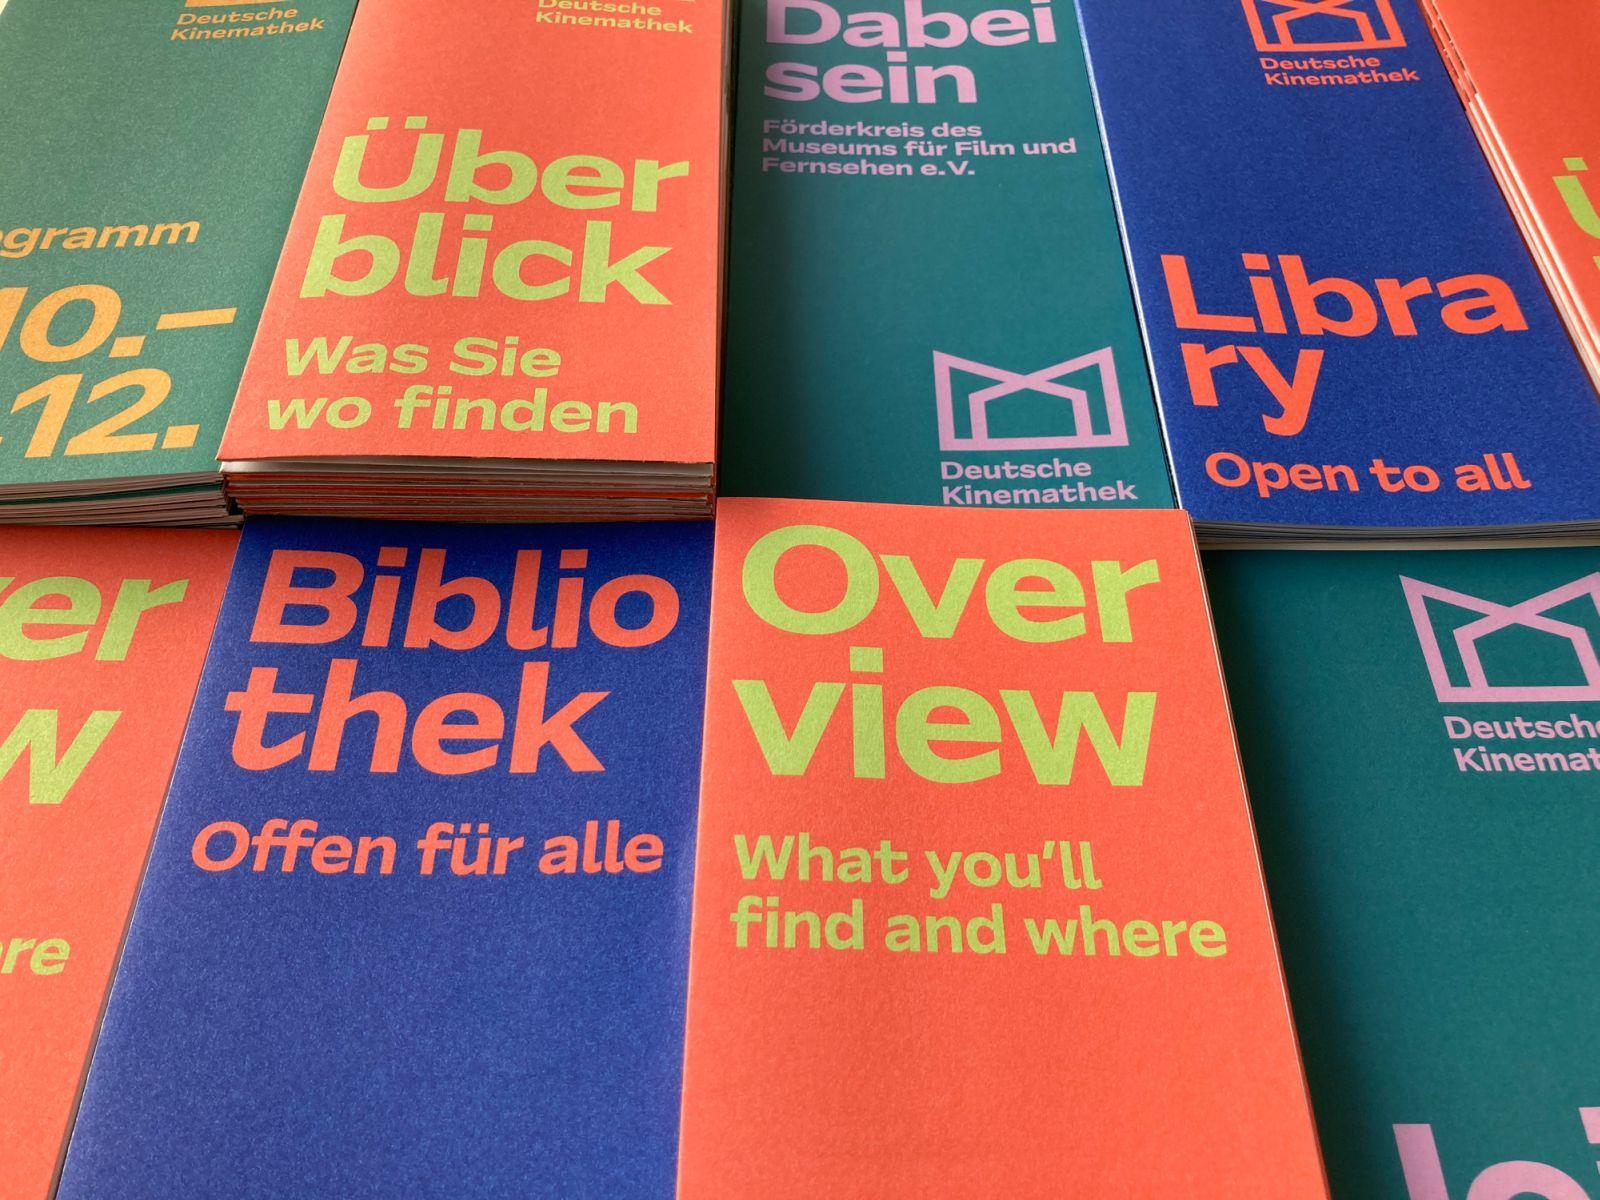 The flyers of the Deutsche Kinemathek